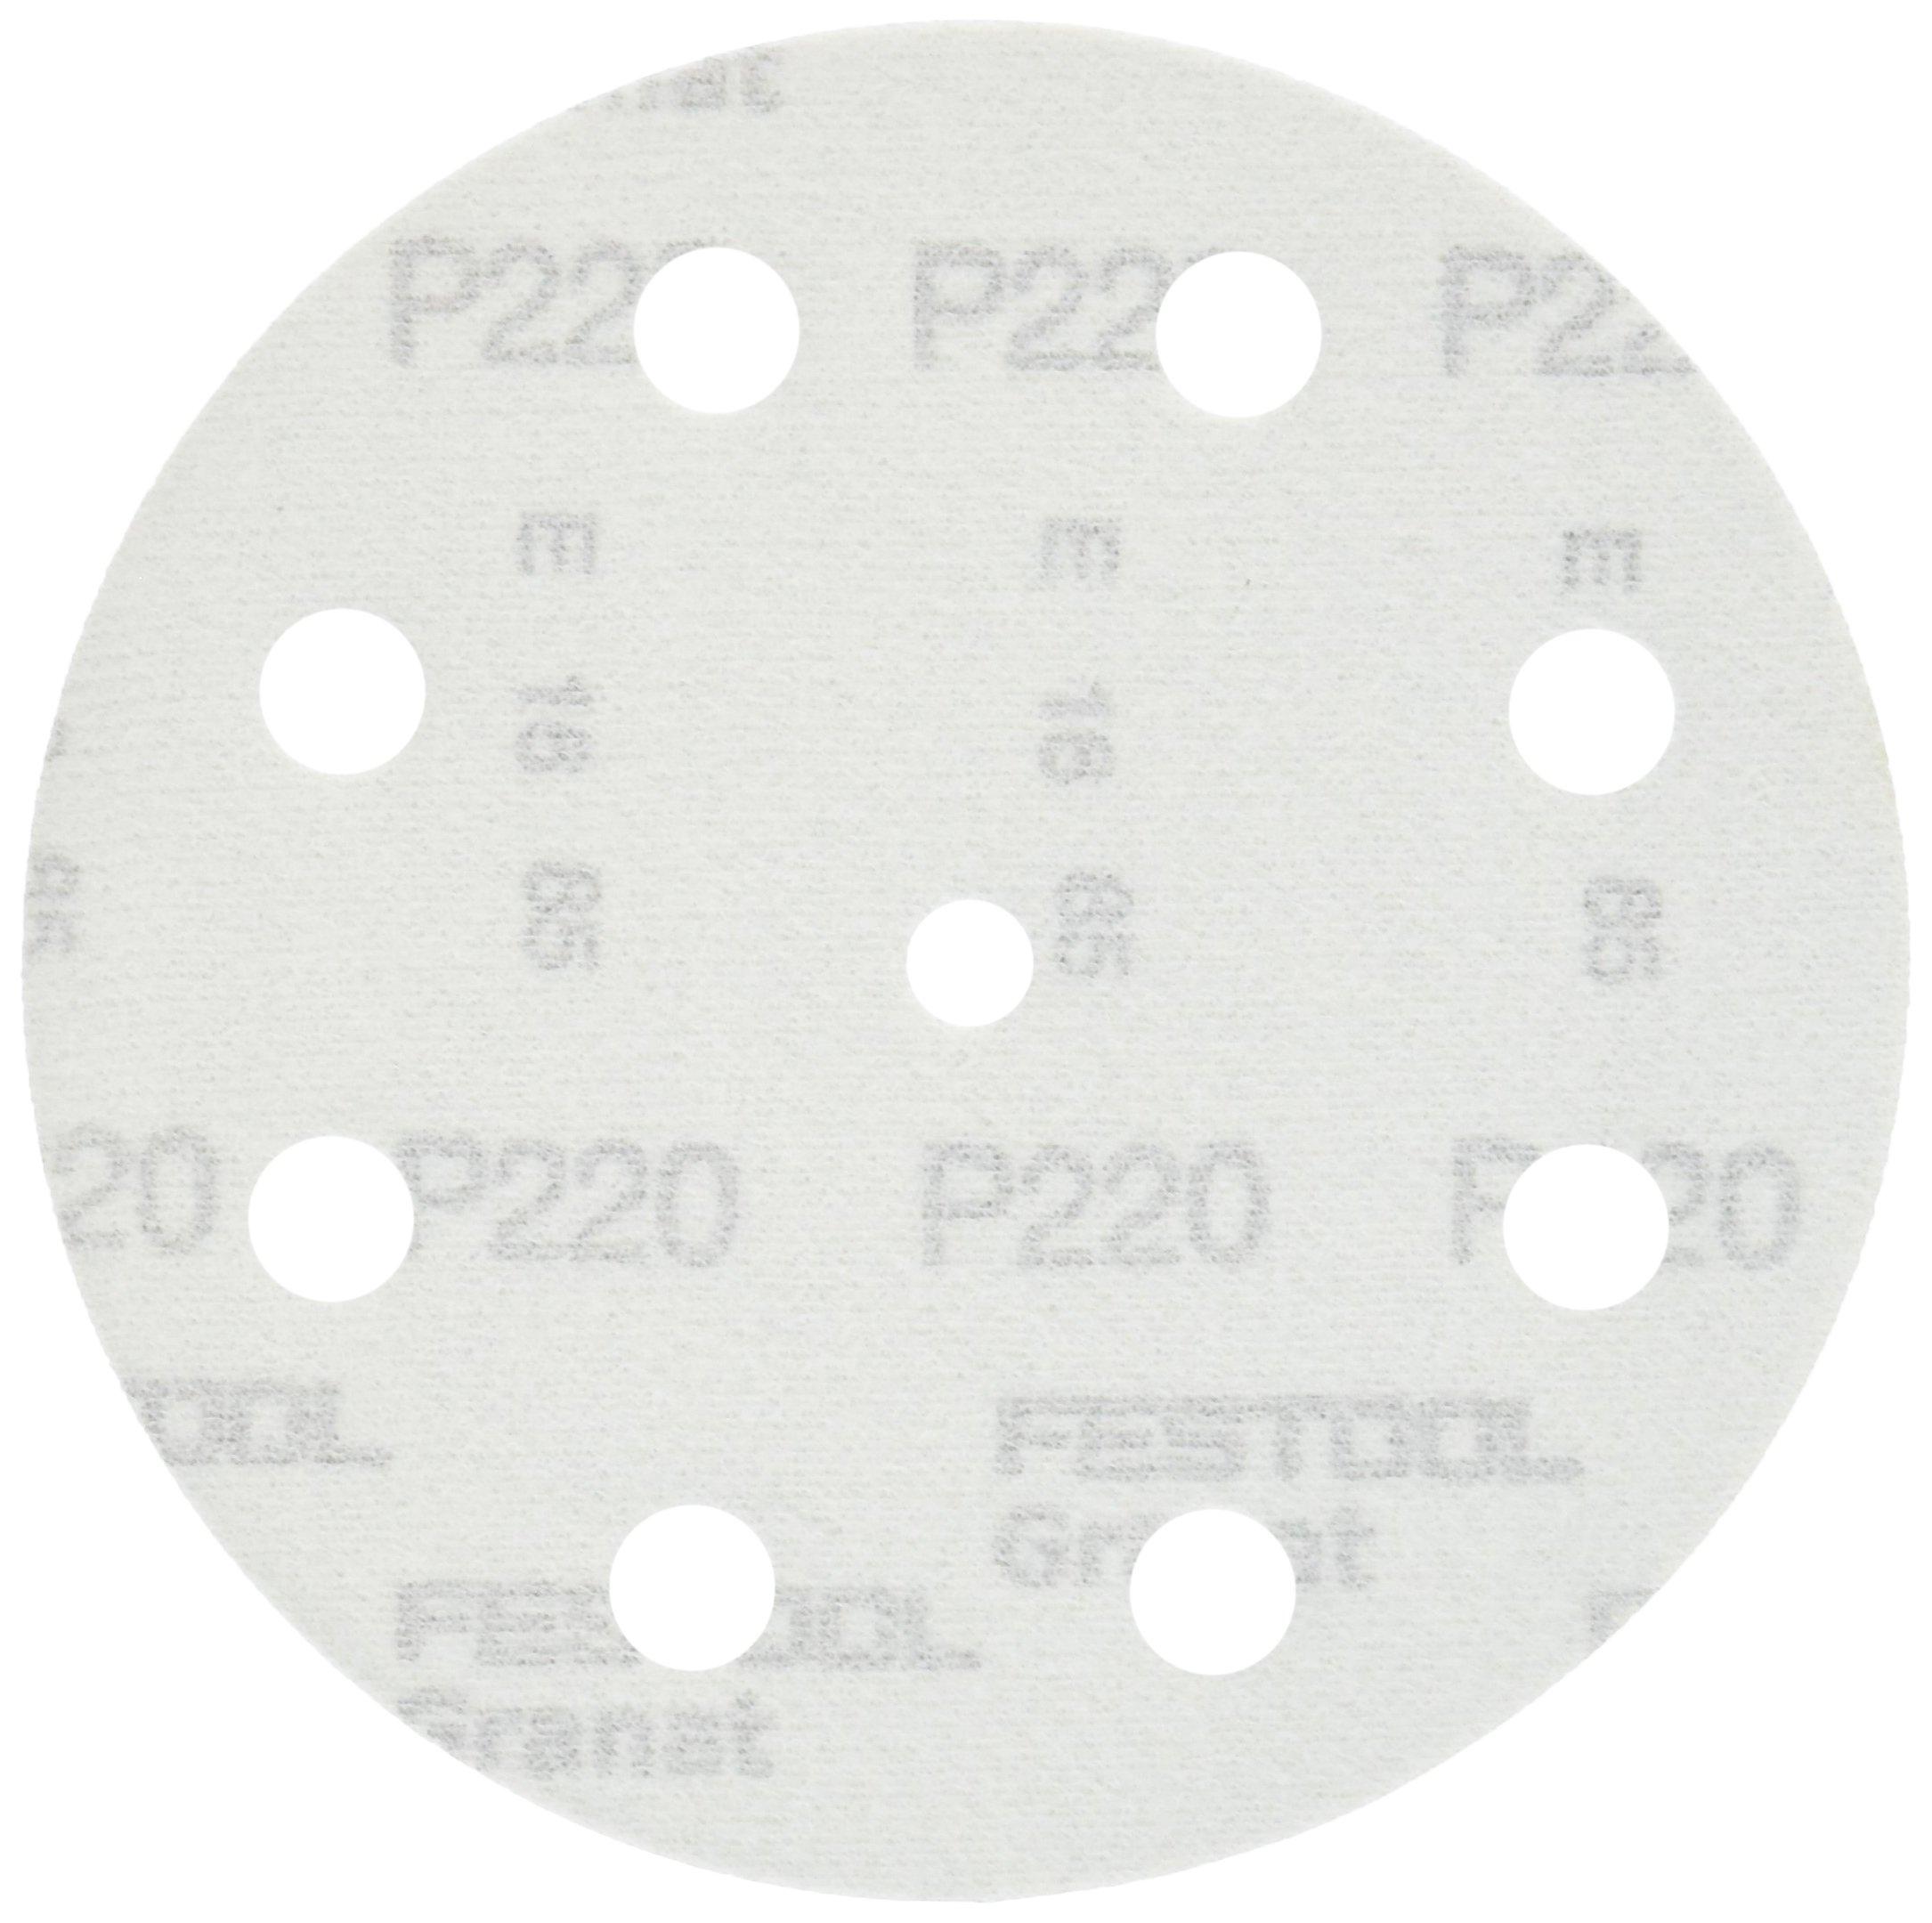 Festool 497150 P320 Grit Pack of 10 Granat Abrasives